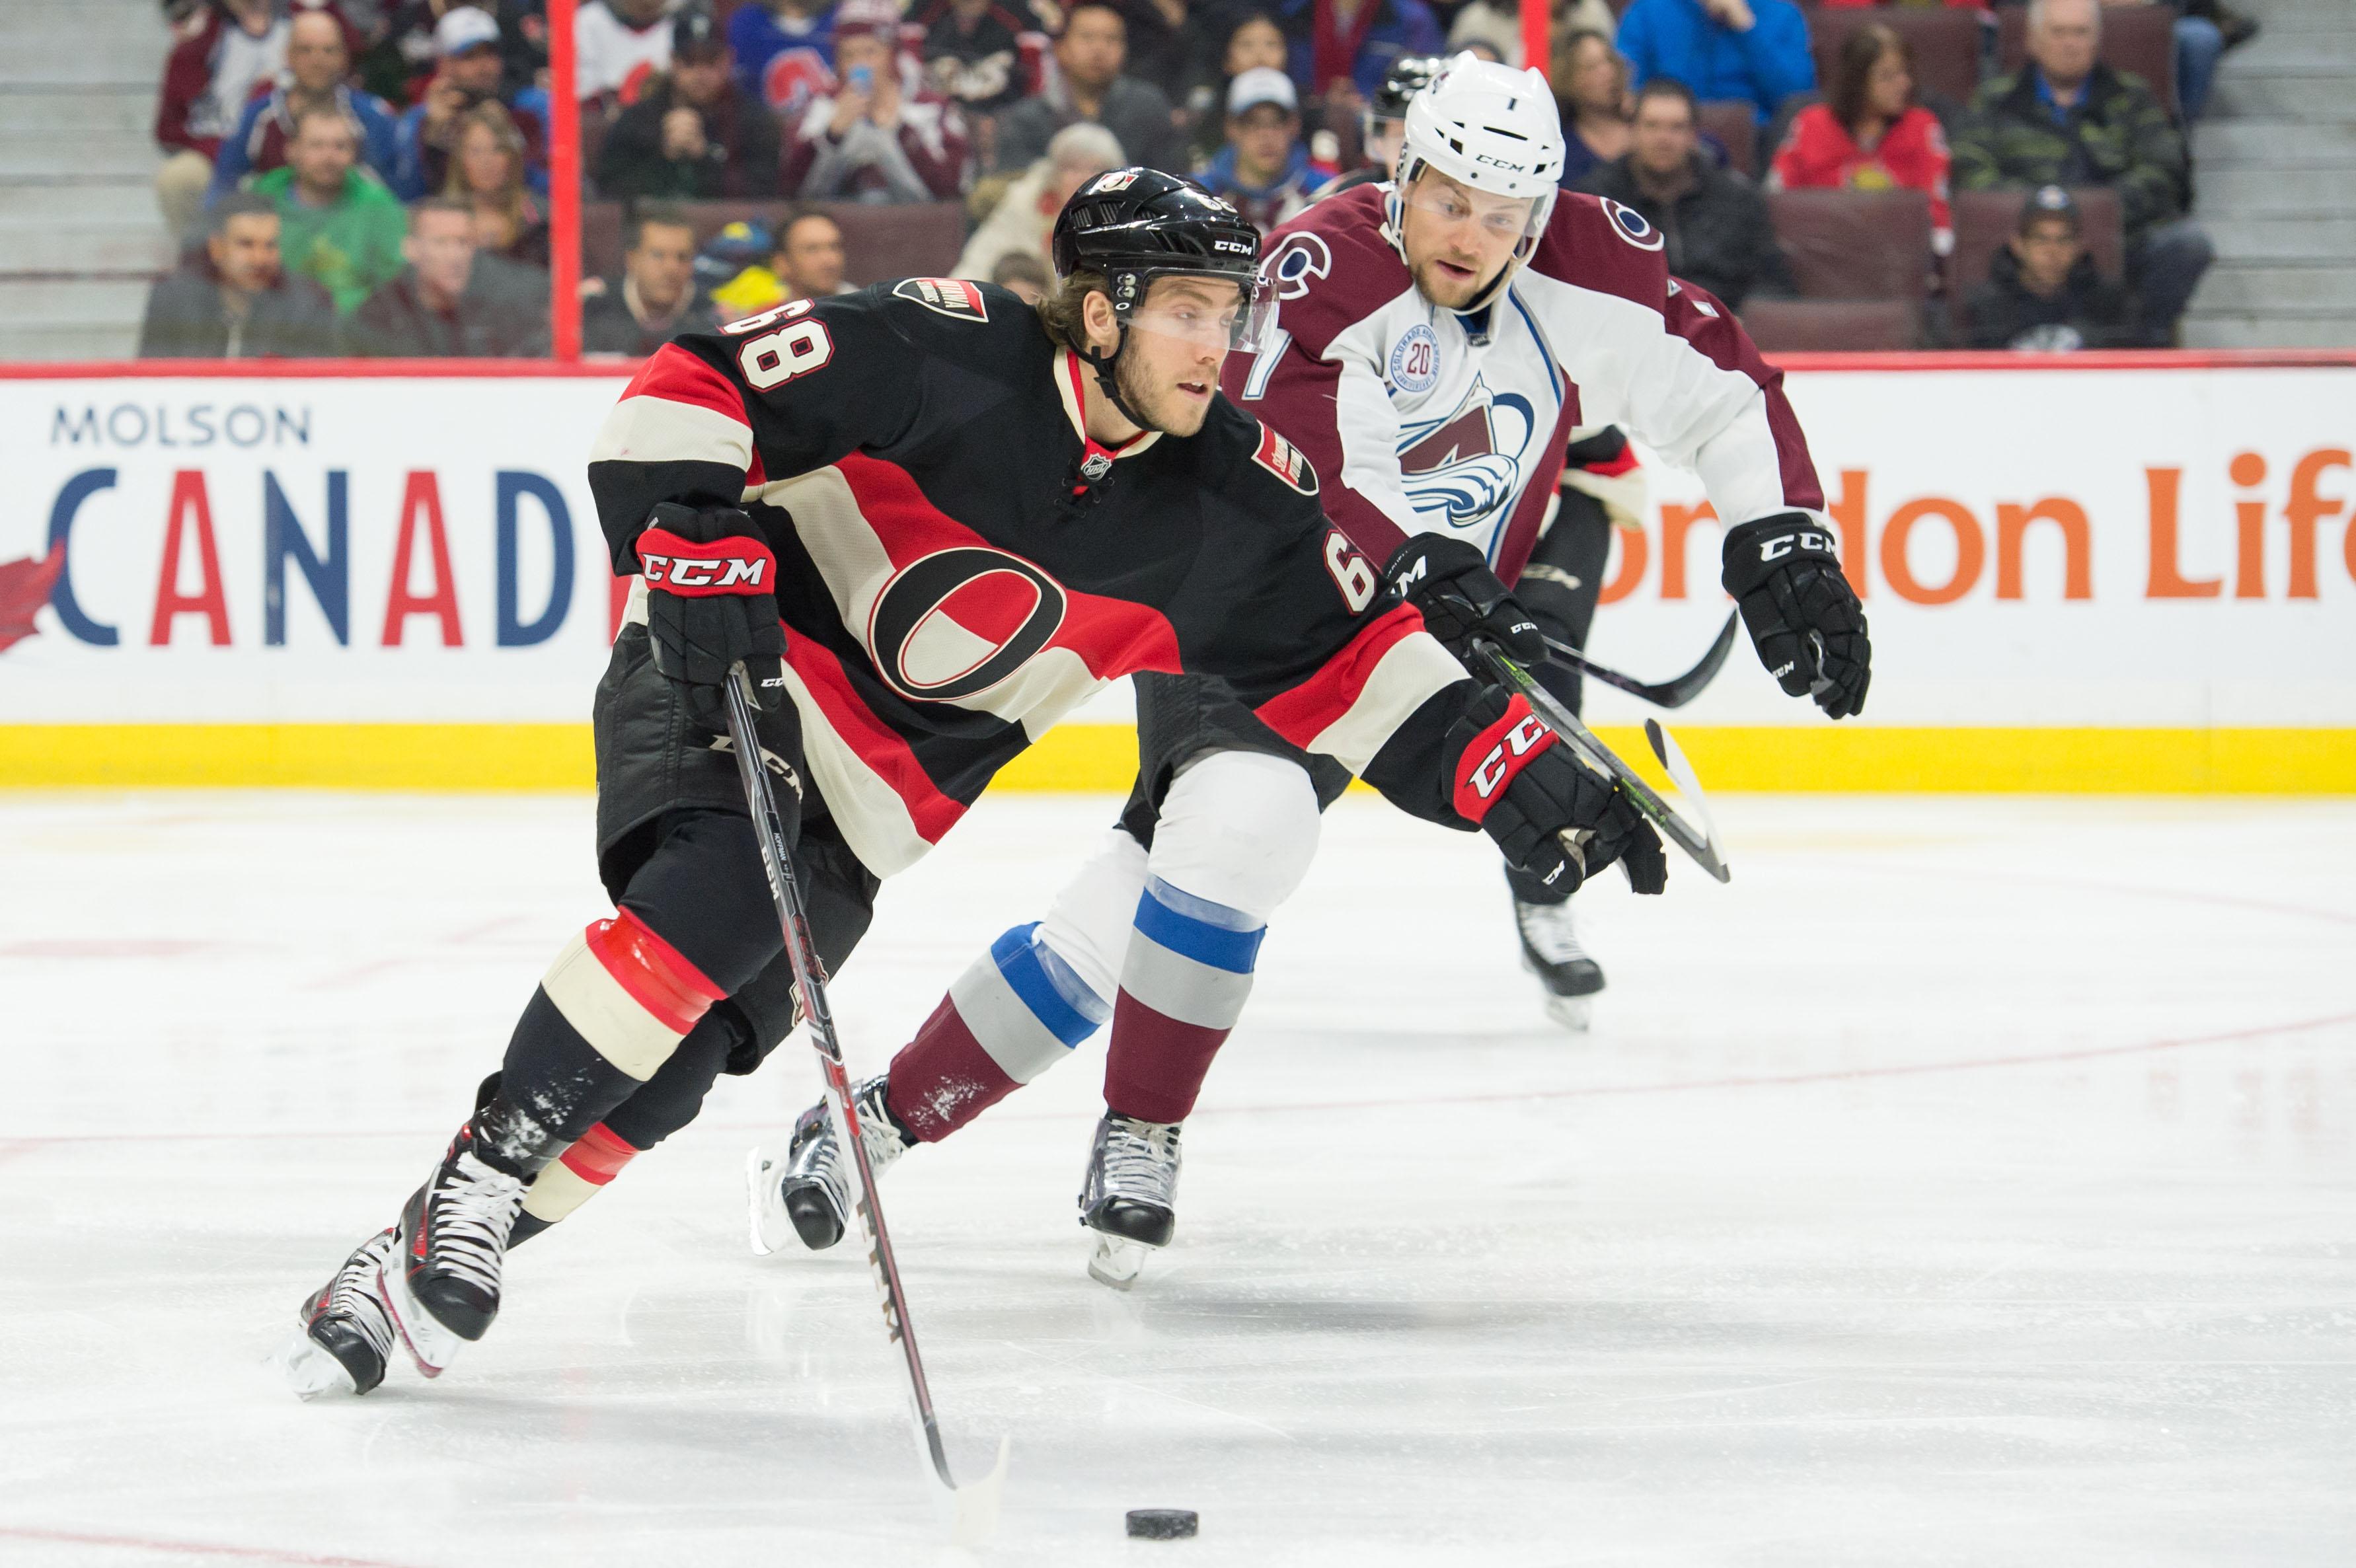 NHL: Colorado Avalanche at Ottawa Senators